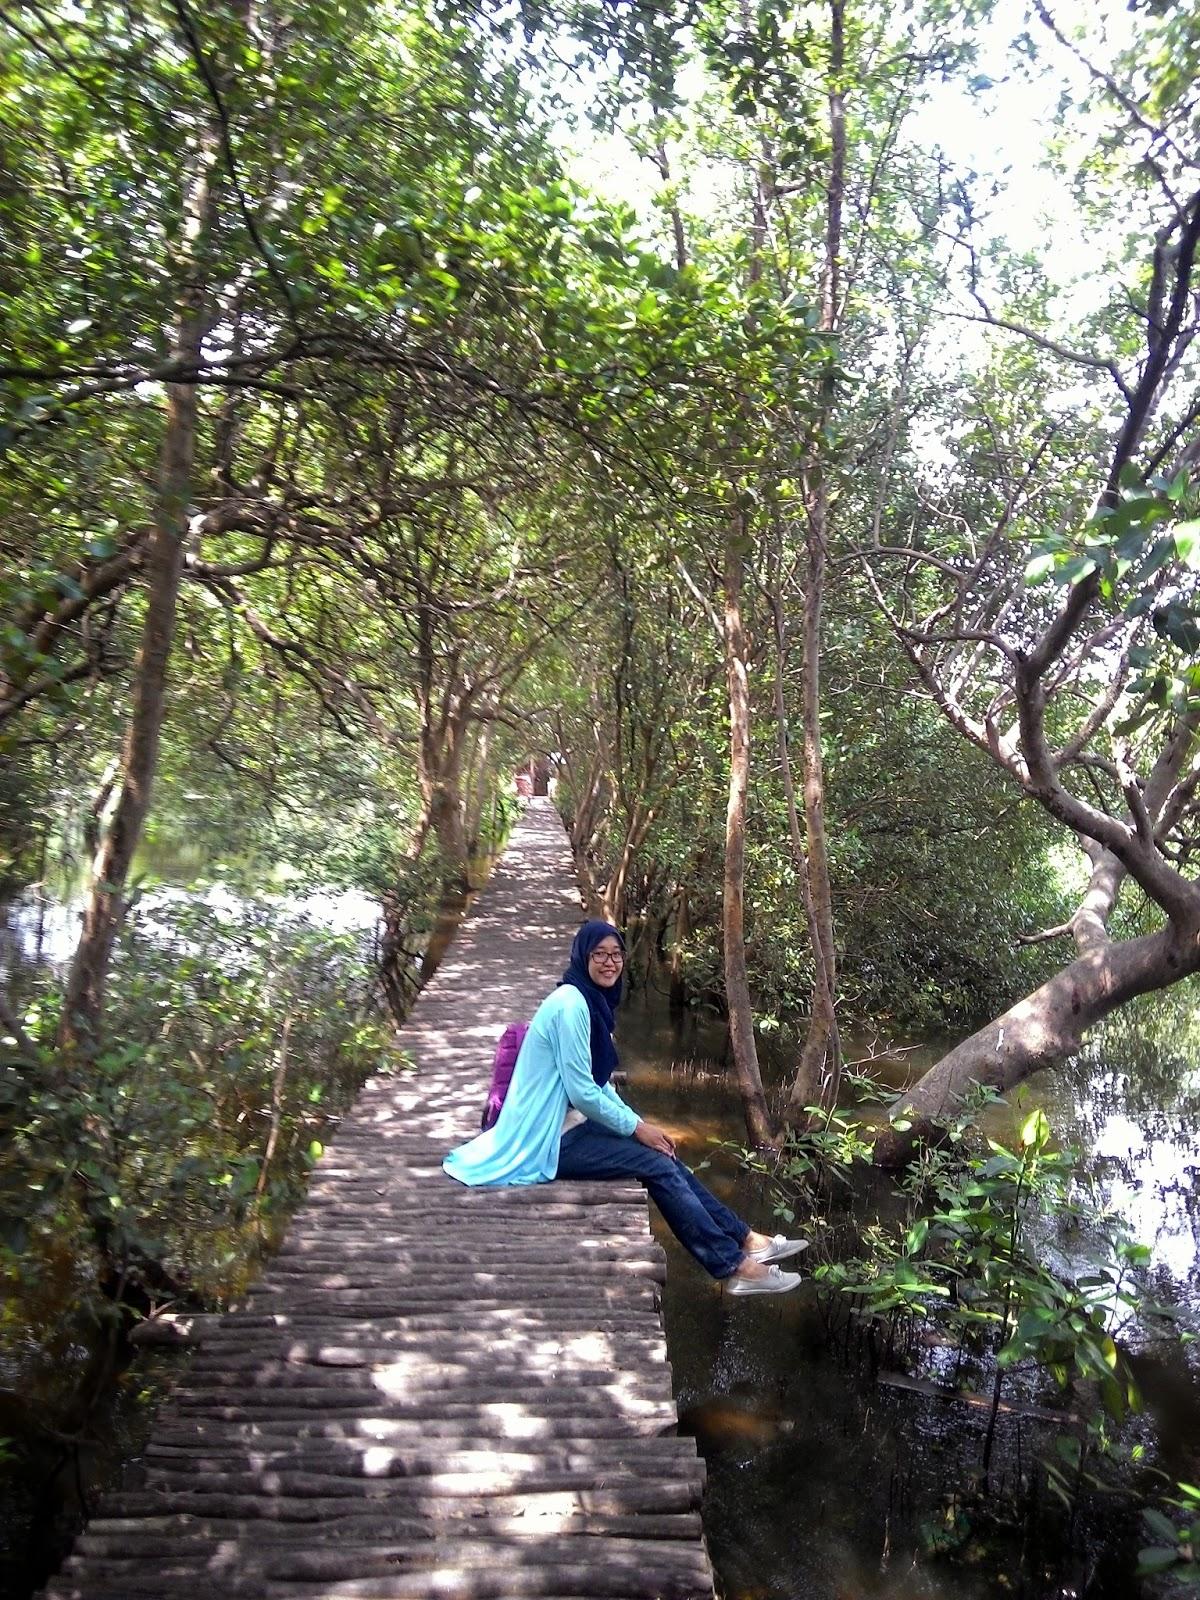 Review Taman Hutan Mangrove PIK Tempat Asik Liburan Jakarta - Asalasah